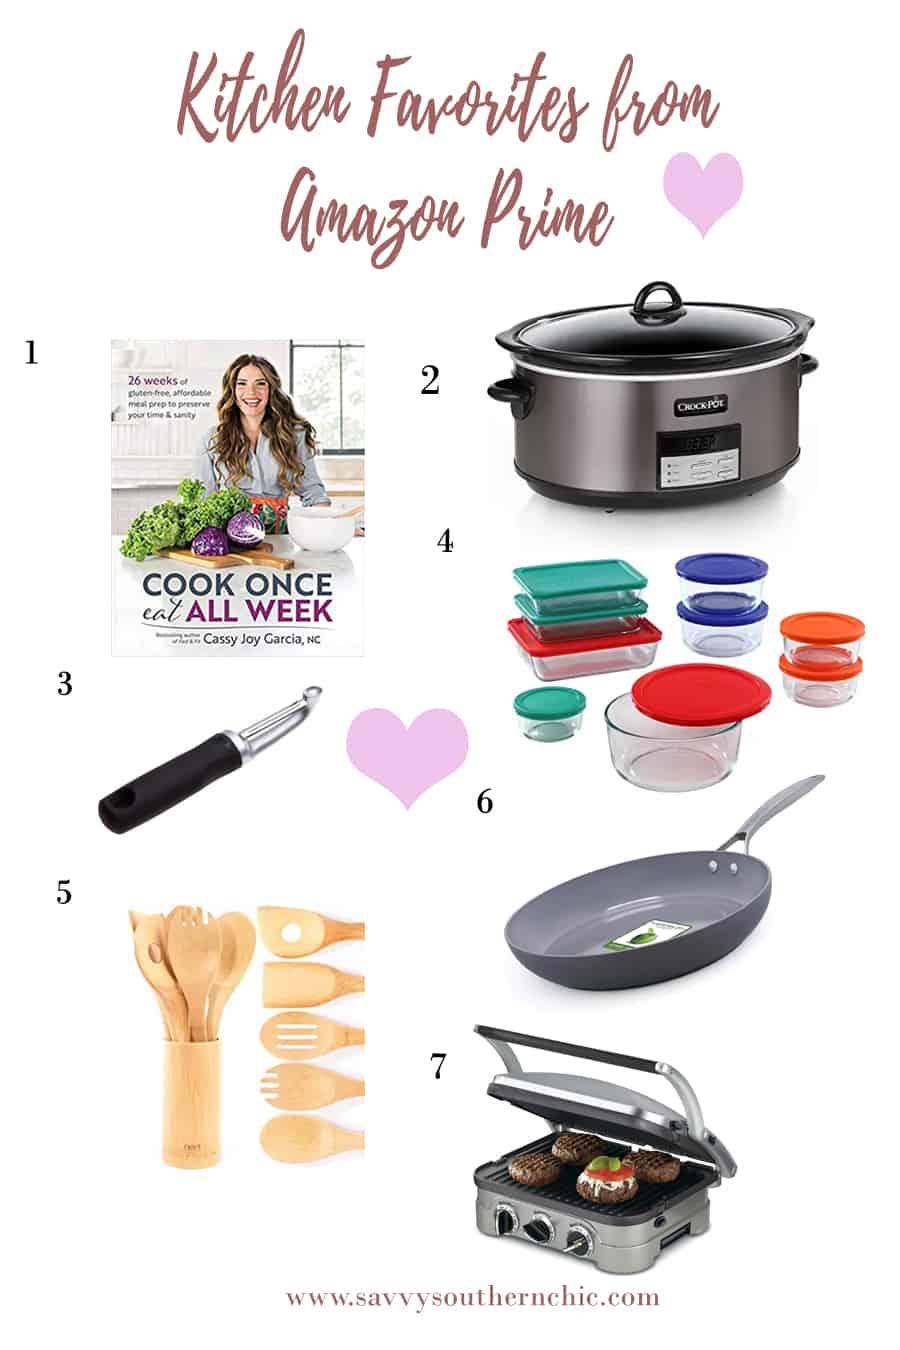 kitchen favorites from Amazon prime